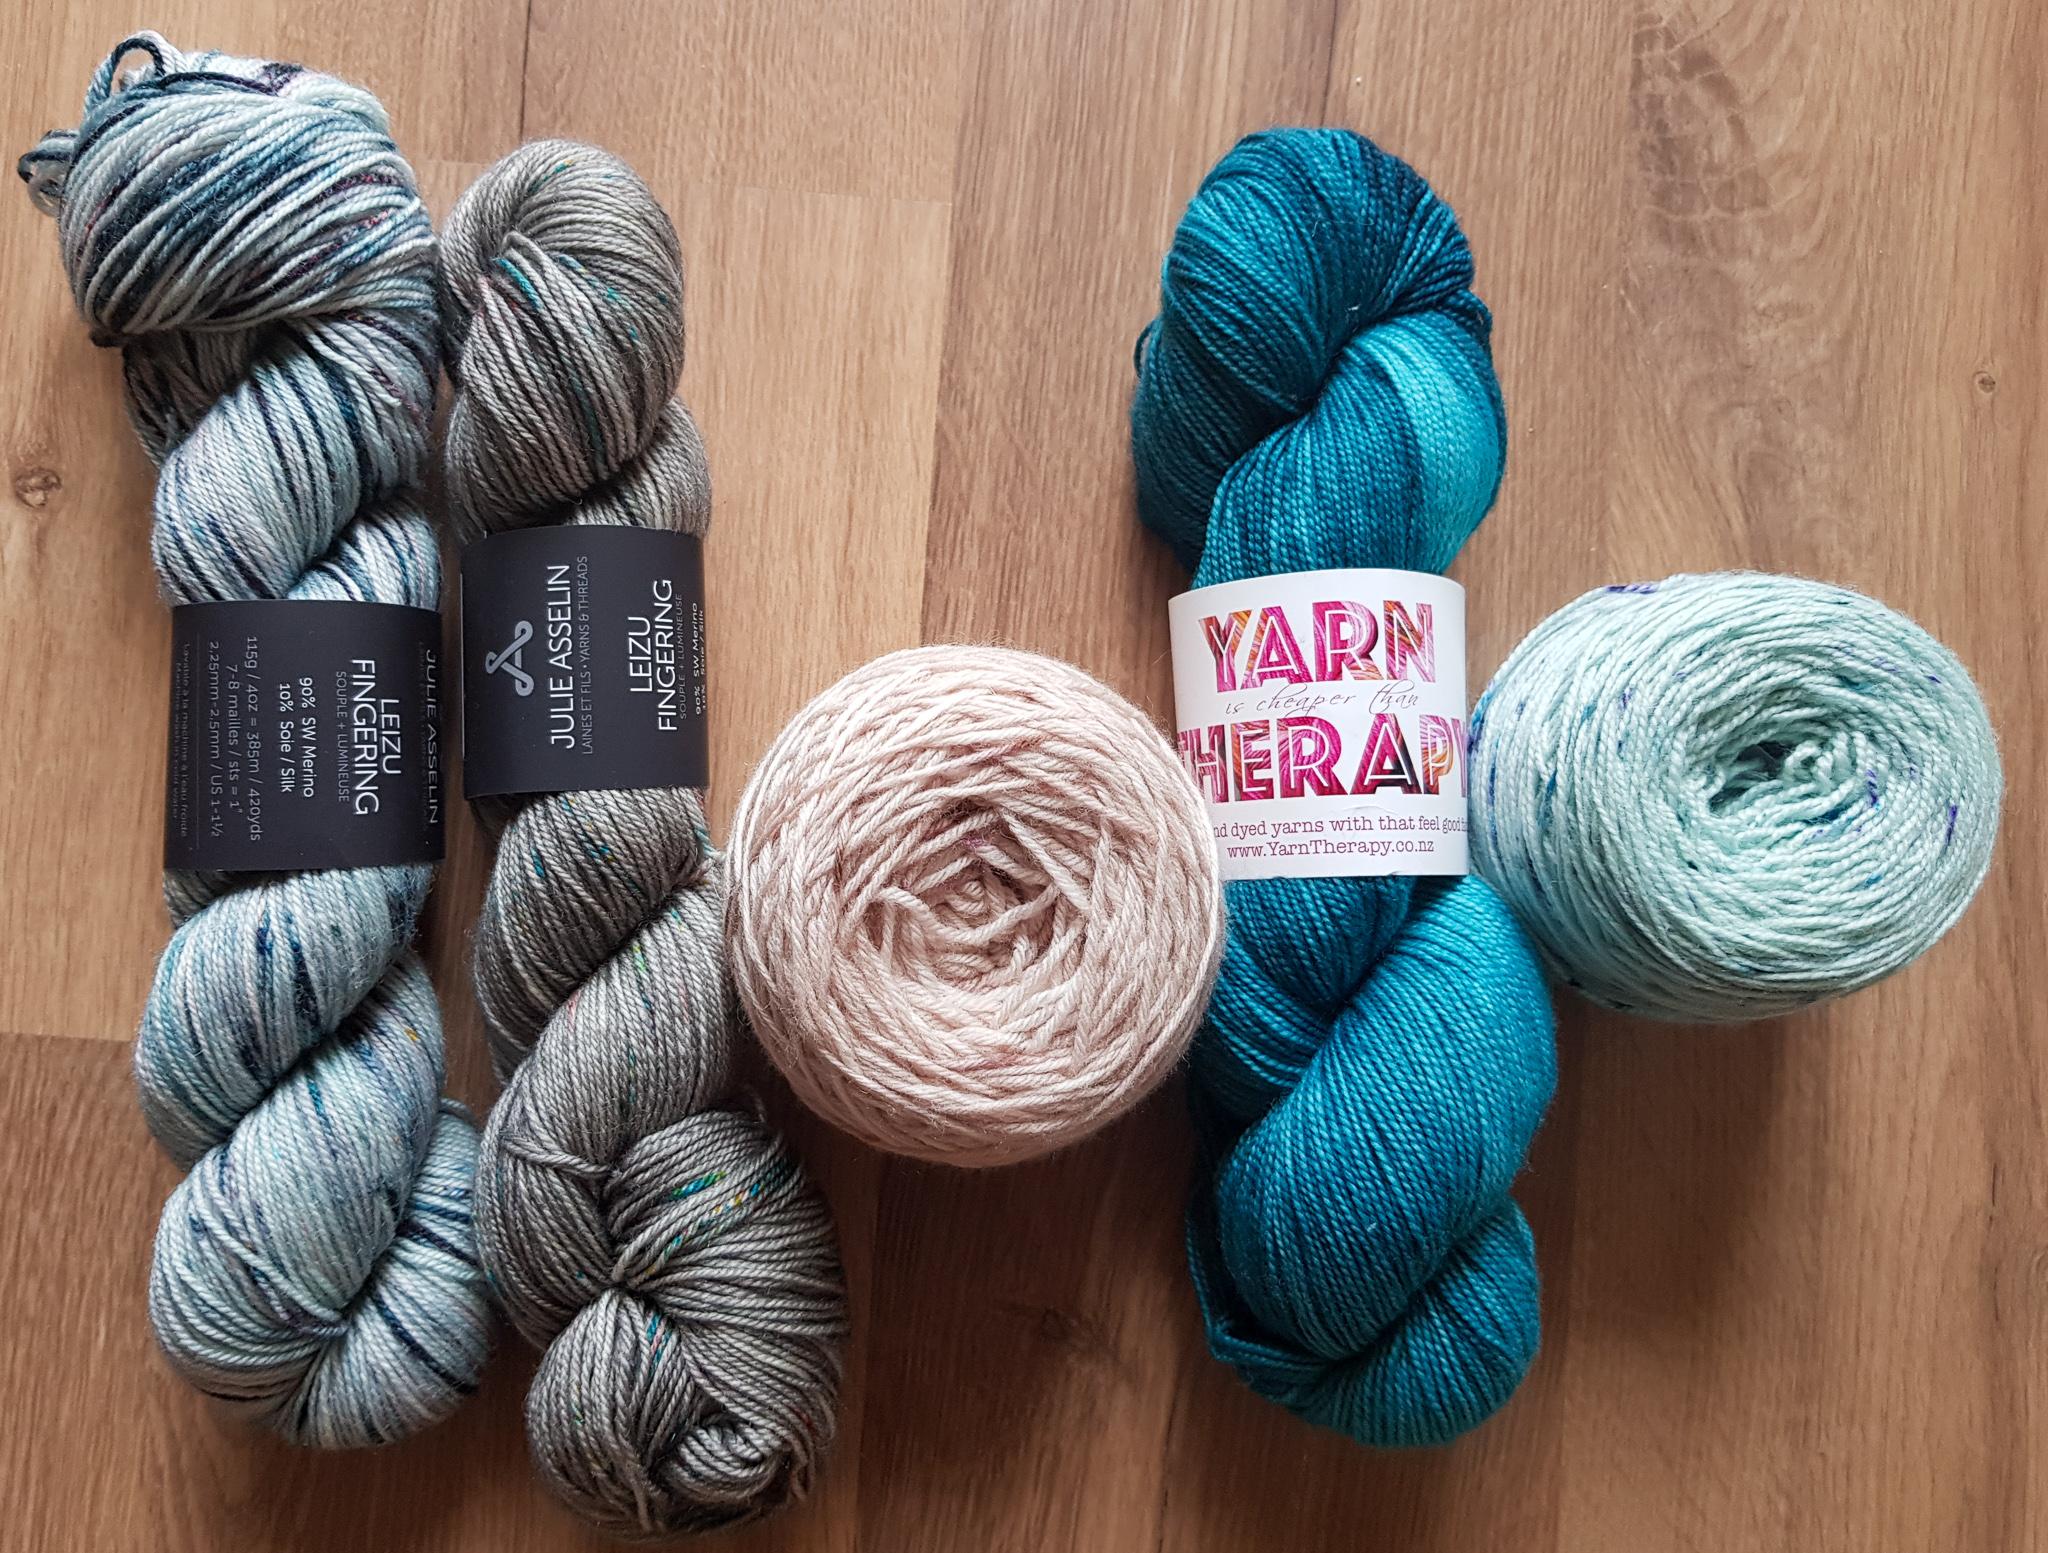 Woolly Crafty Prints Knitting Yarn 100/% Pure Wool 8 Ply 100g Hanks #62 PINK LIL